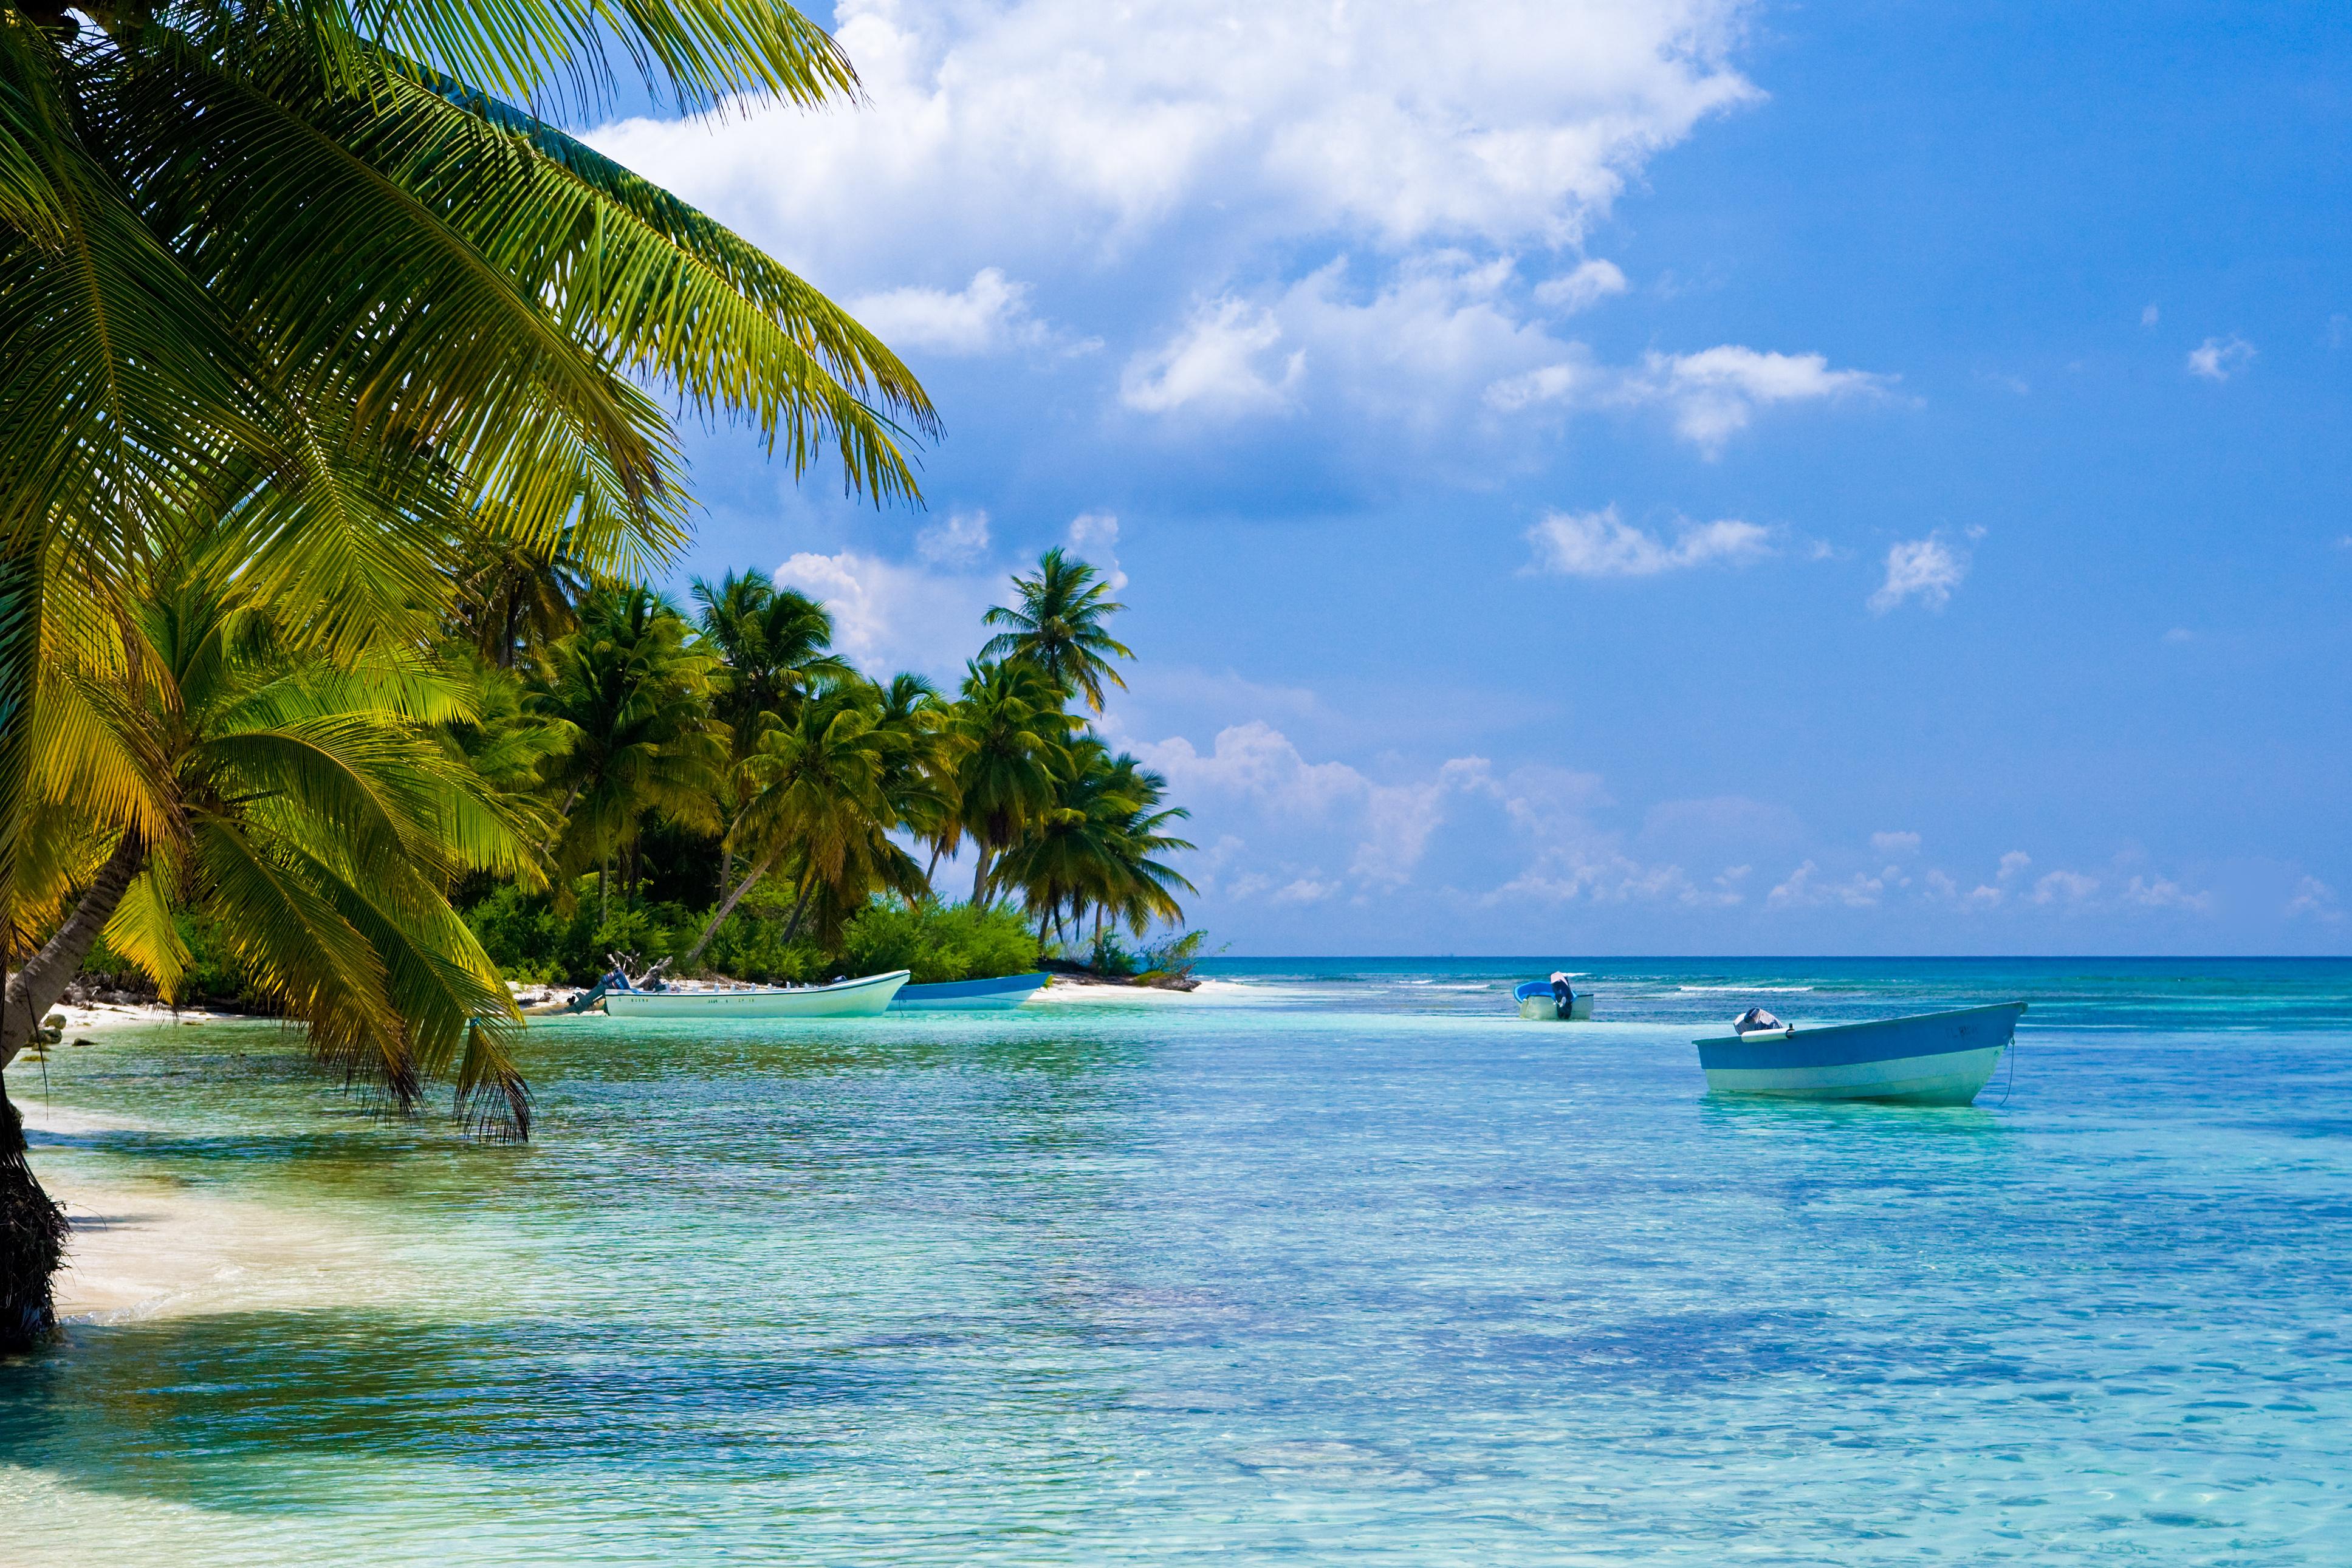 Green palms on a white sand beach